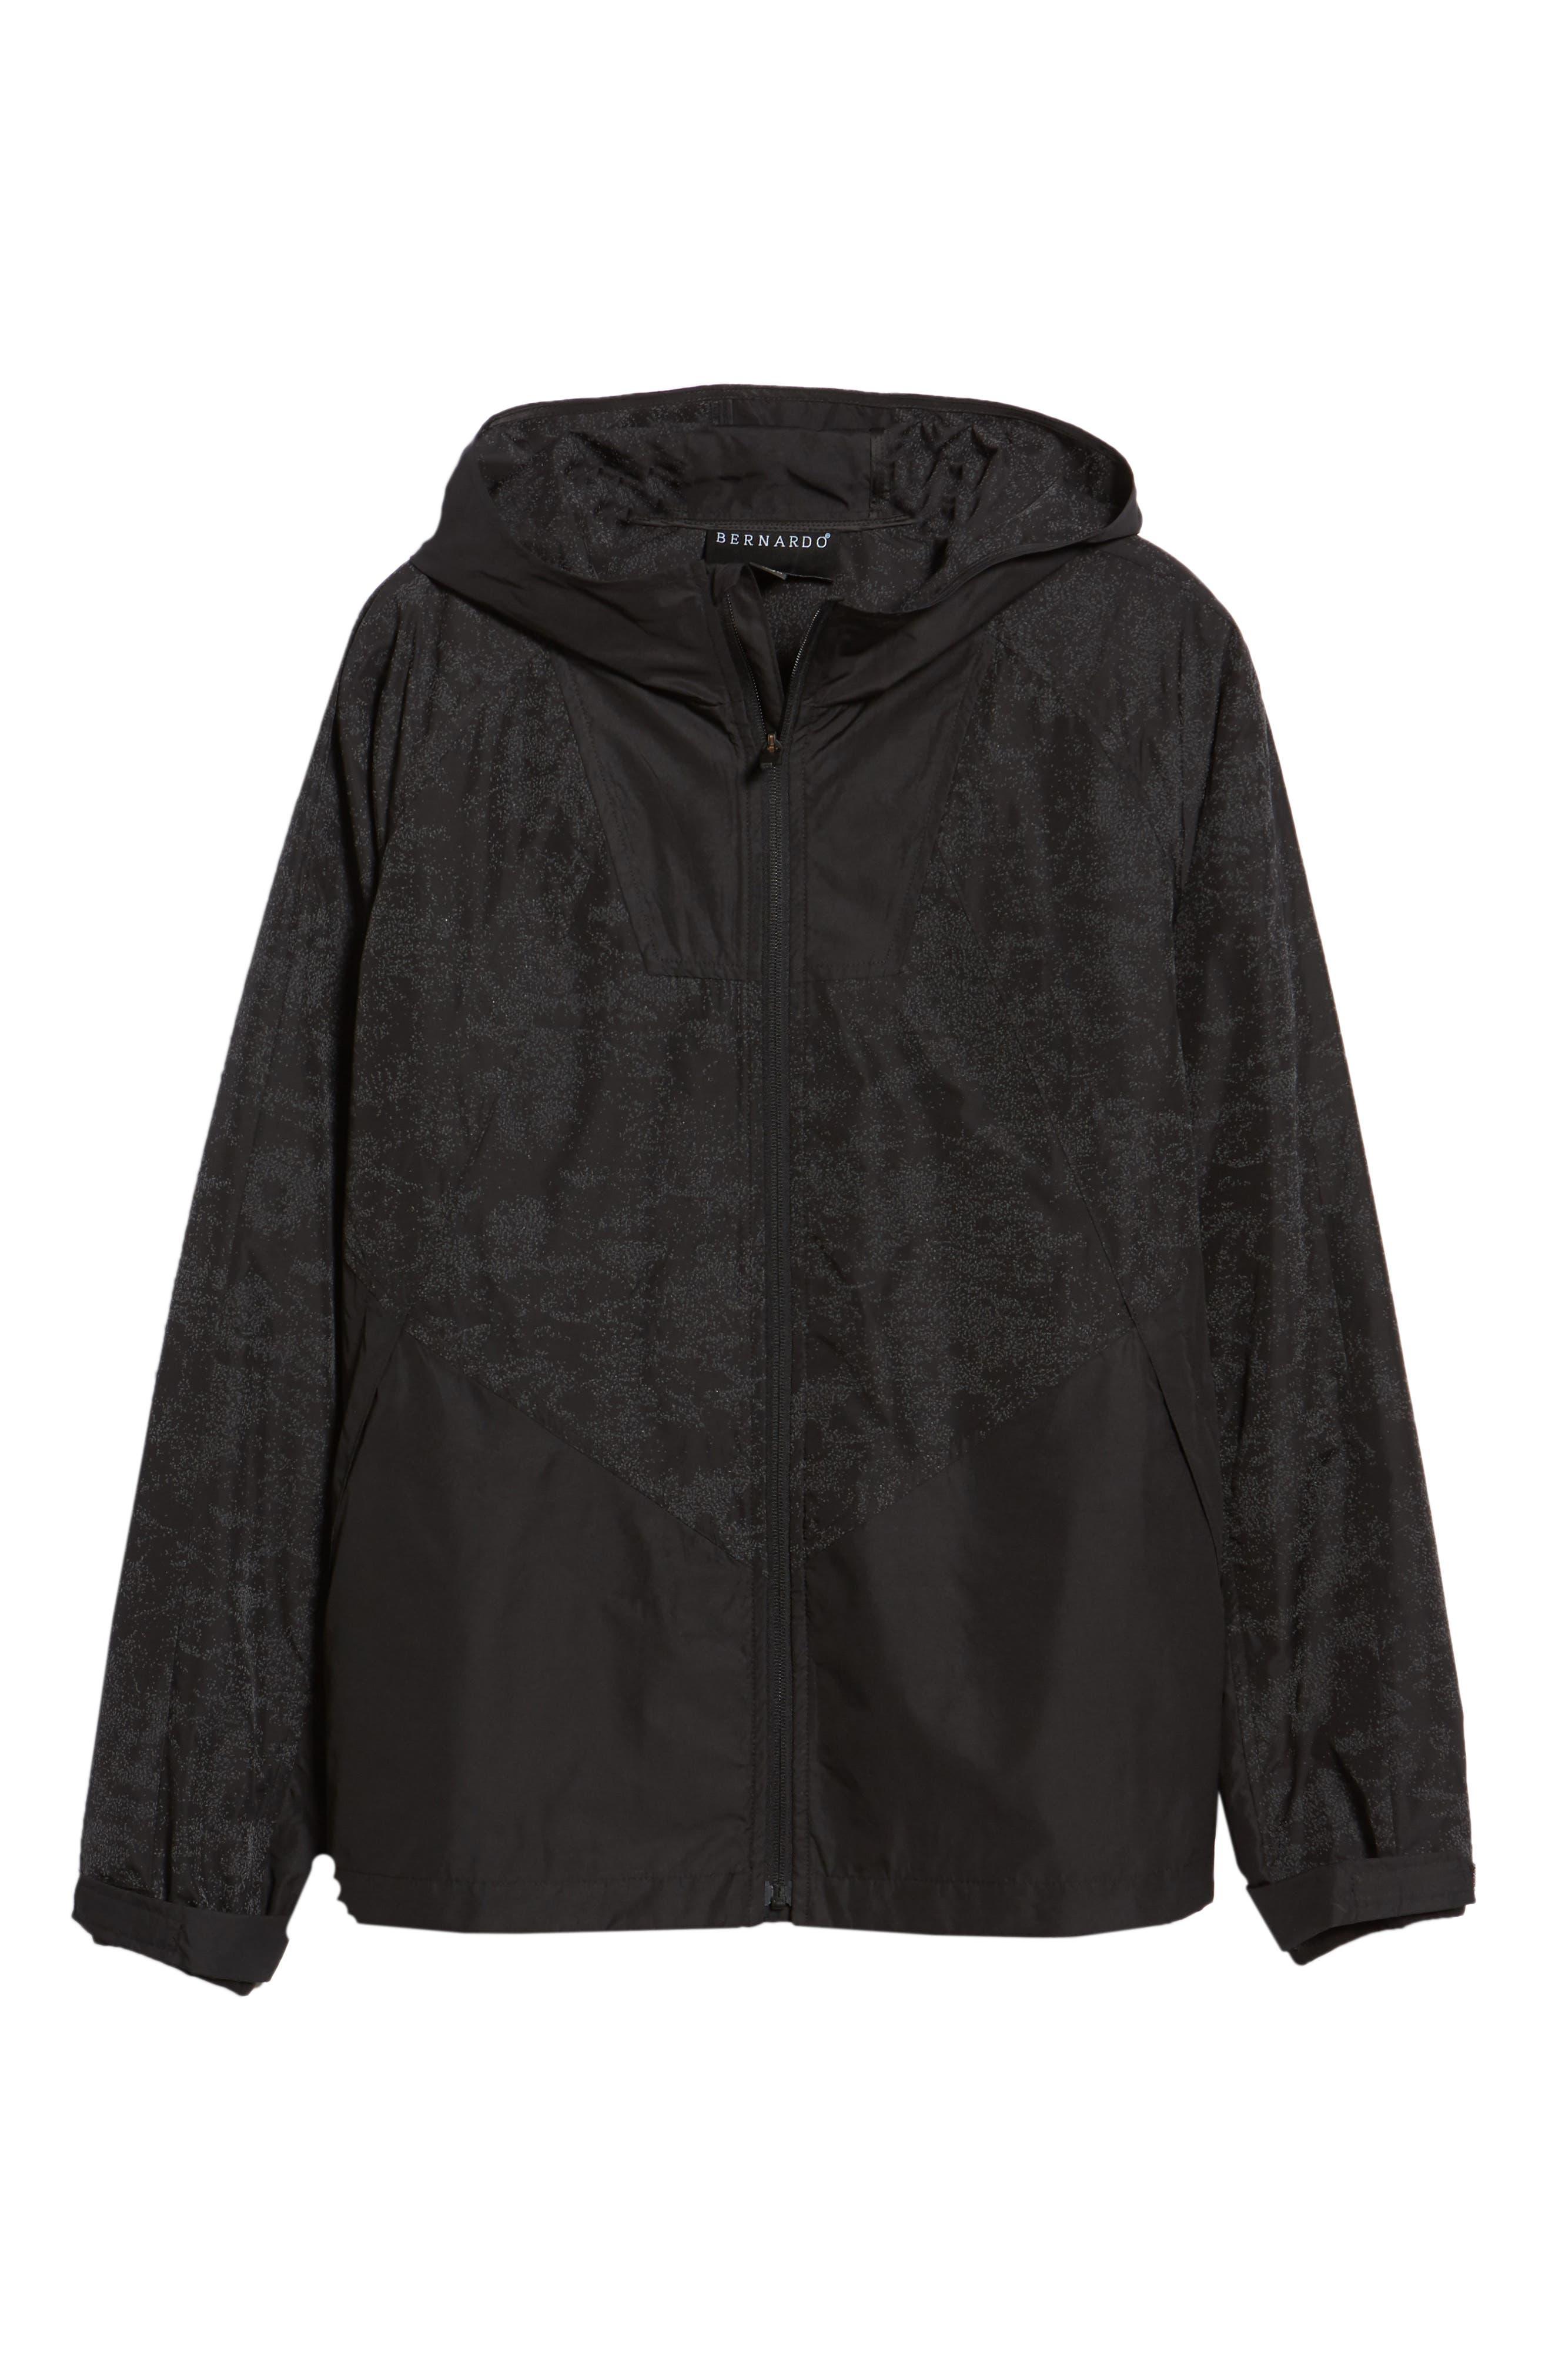 Hooded Reflective Jacket,                             Alternate thumbnail 6, color,                             BLACK REFLECTIVE